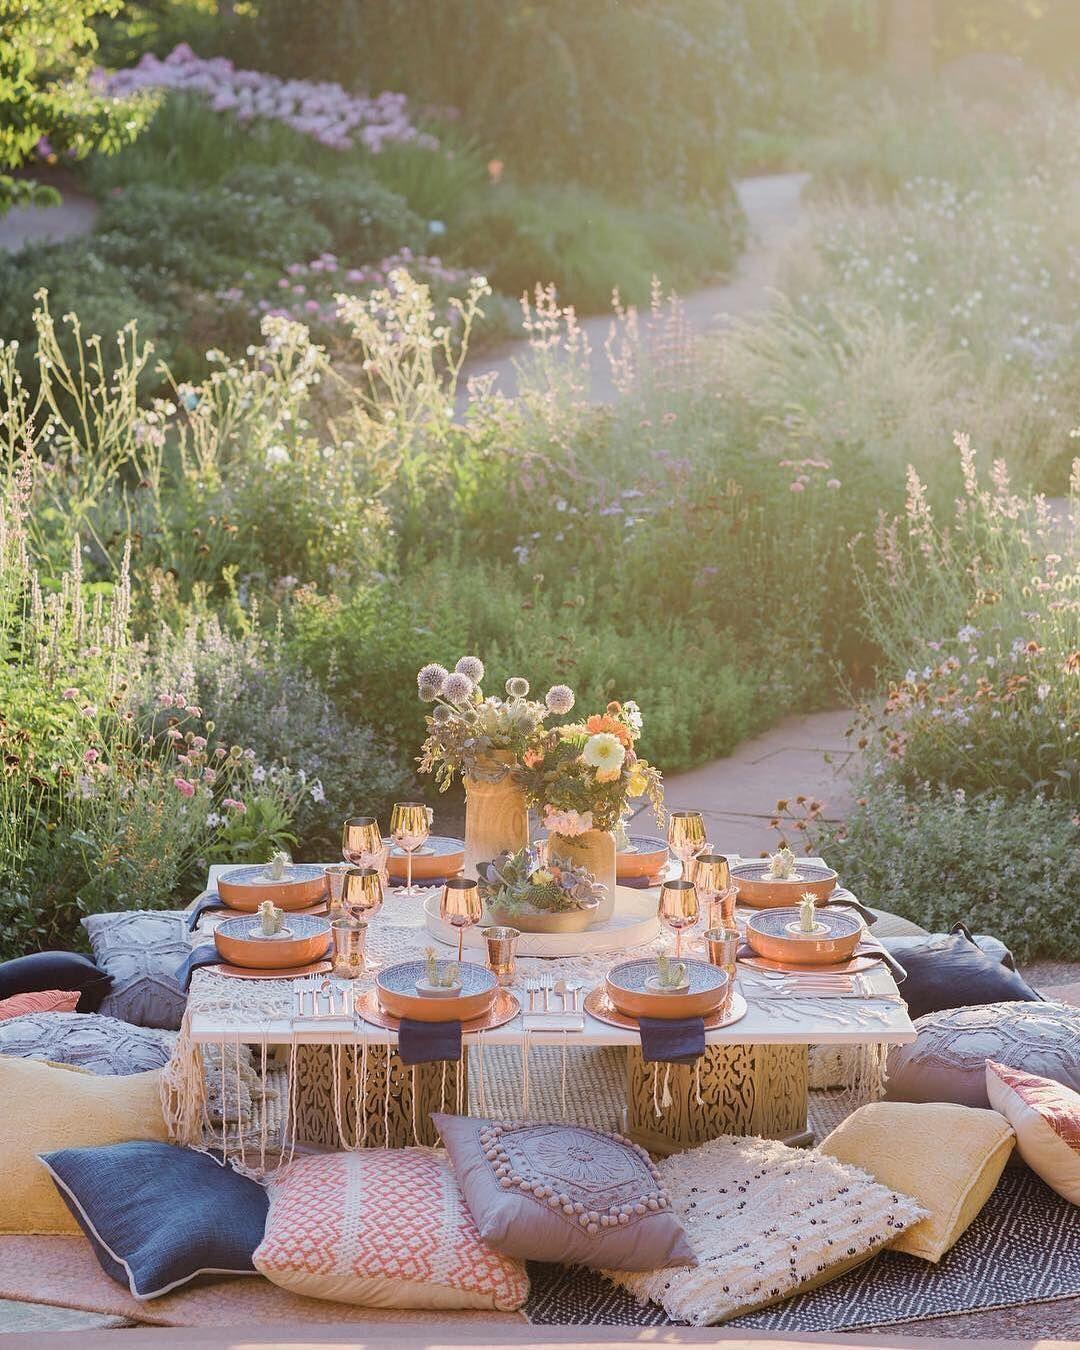 Birthday Table Mountain: Outdoor Parties, Decor, Picnic